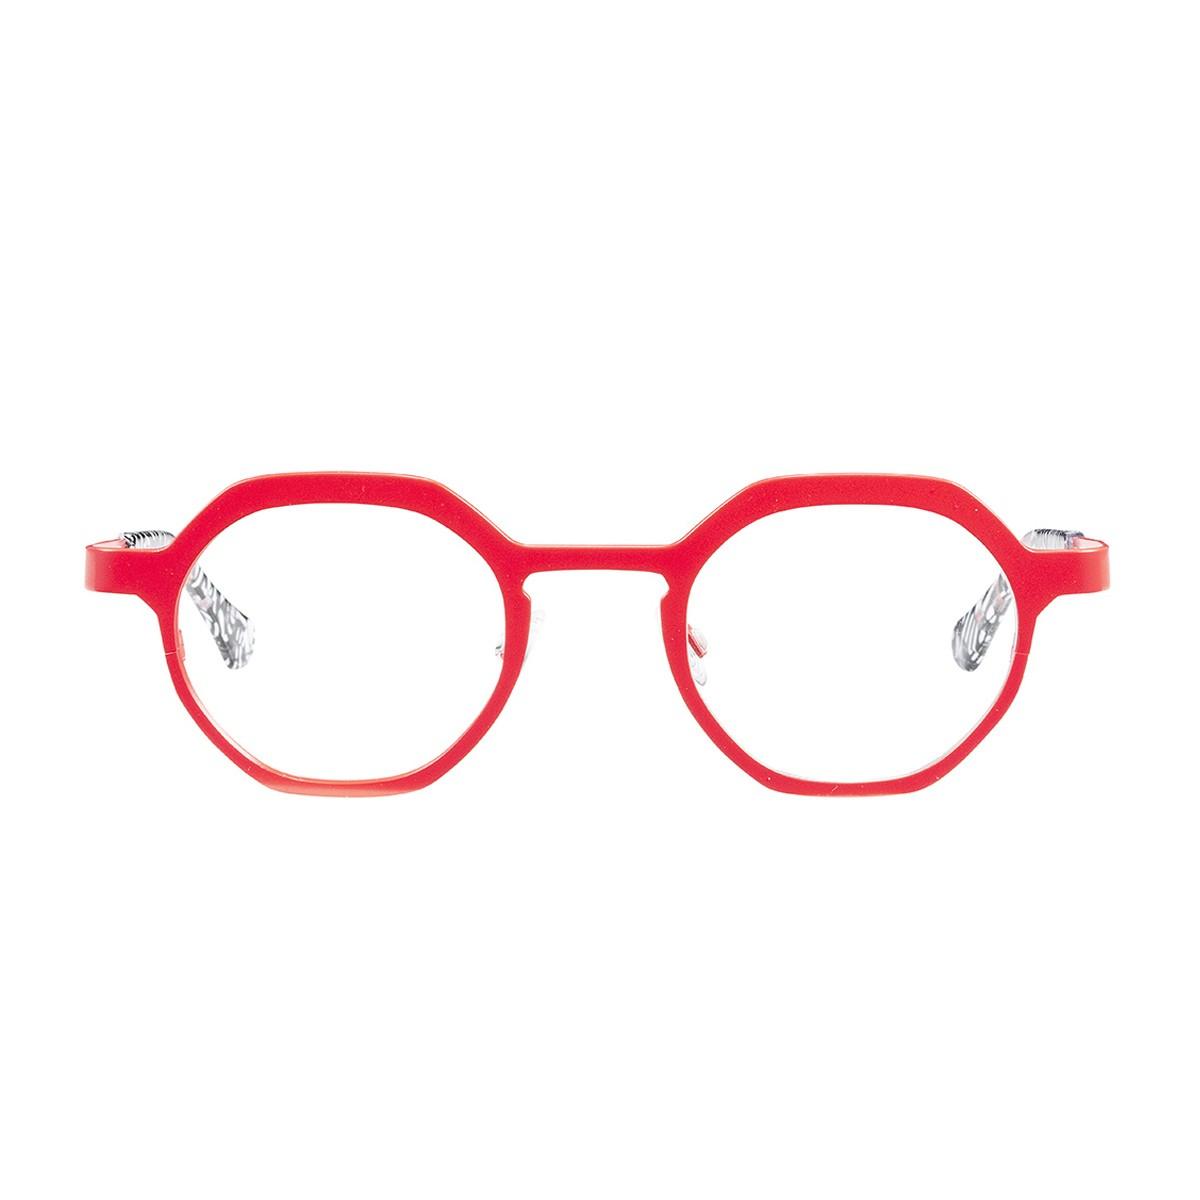 Matttew Retro   Occhiali da vista Unisex